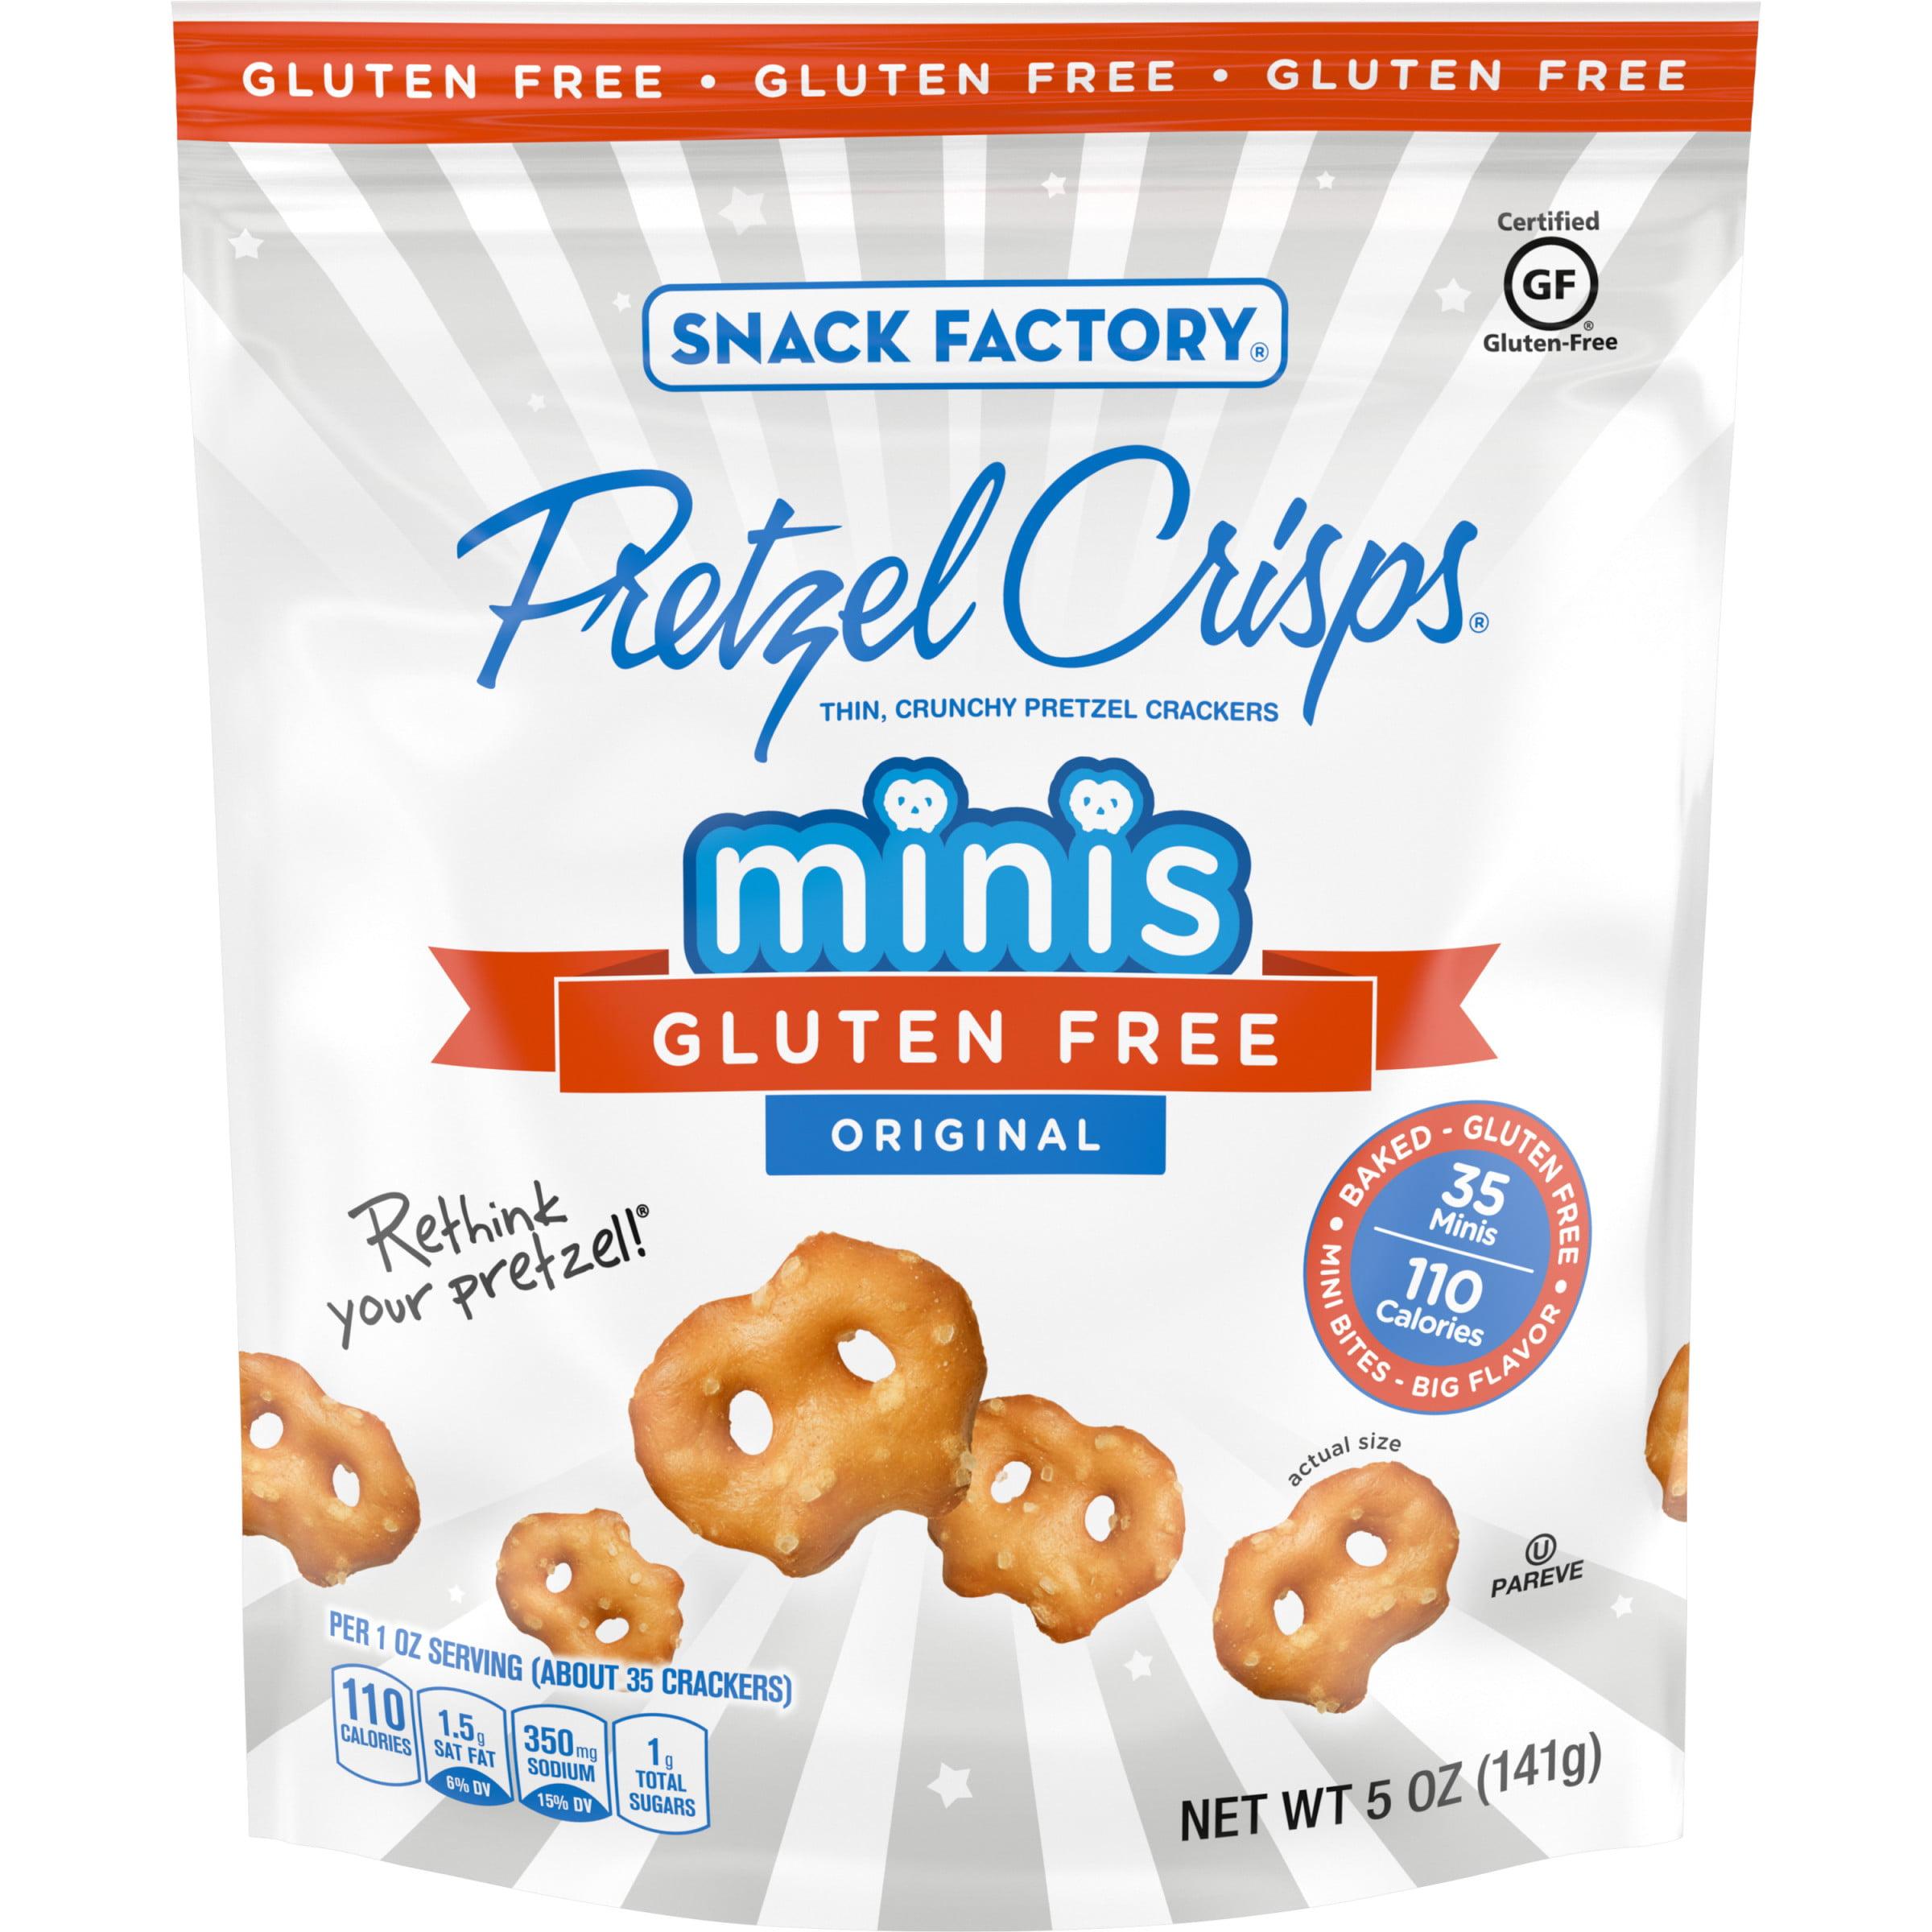 Snack Factory Pretzel Crisps Gluten Free Minis Original ...